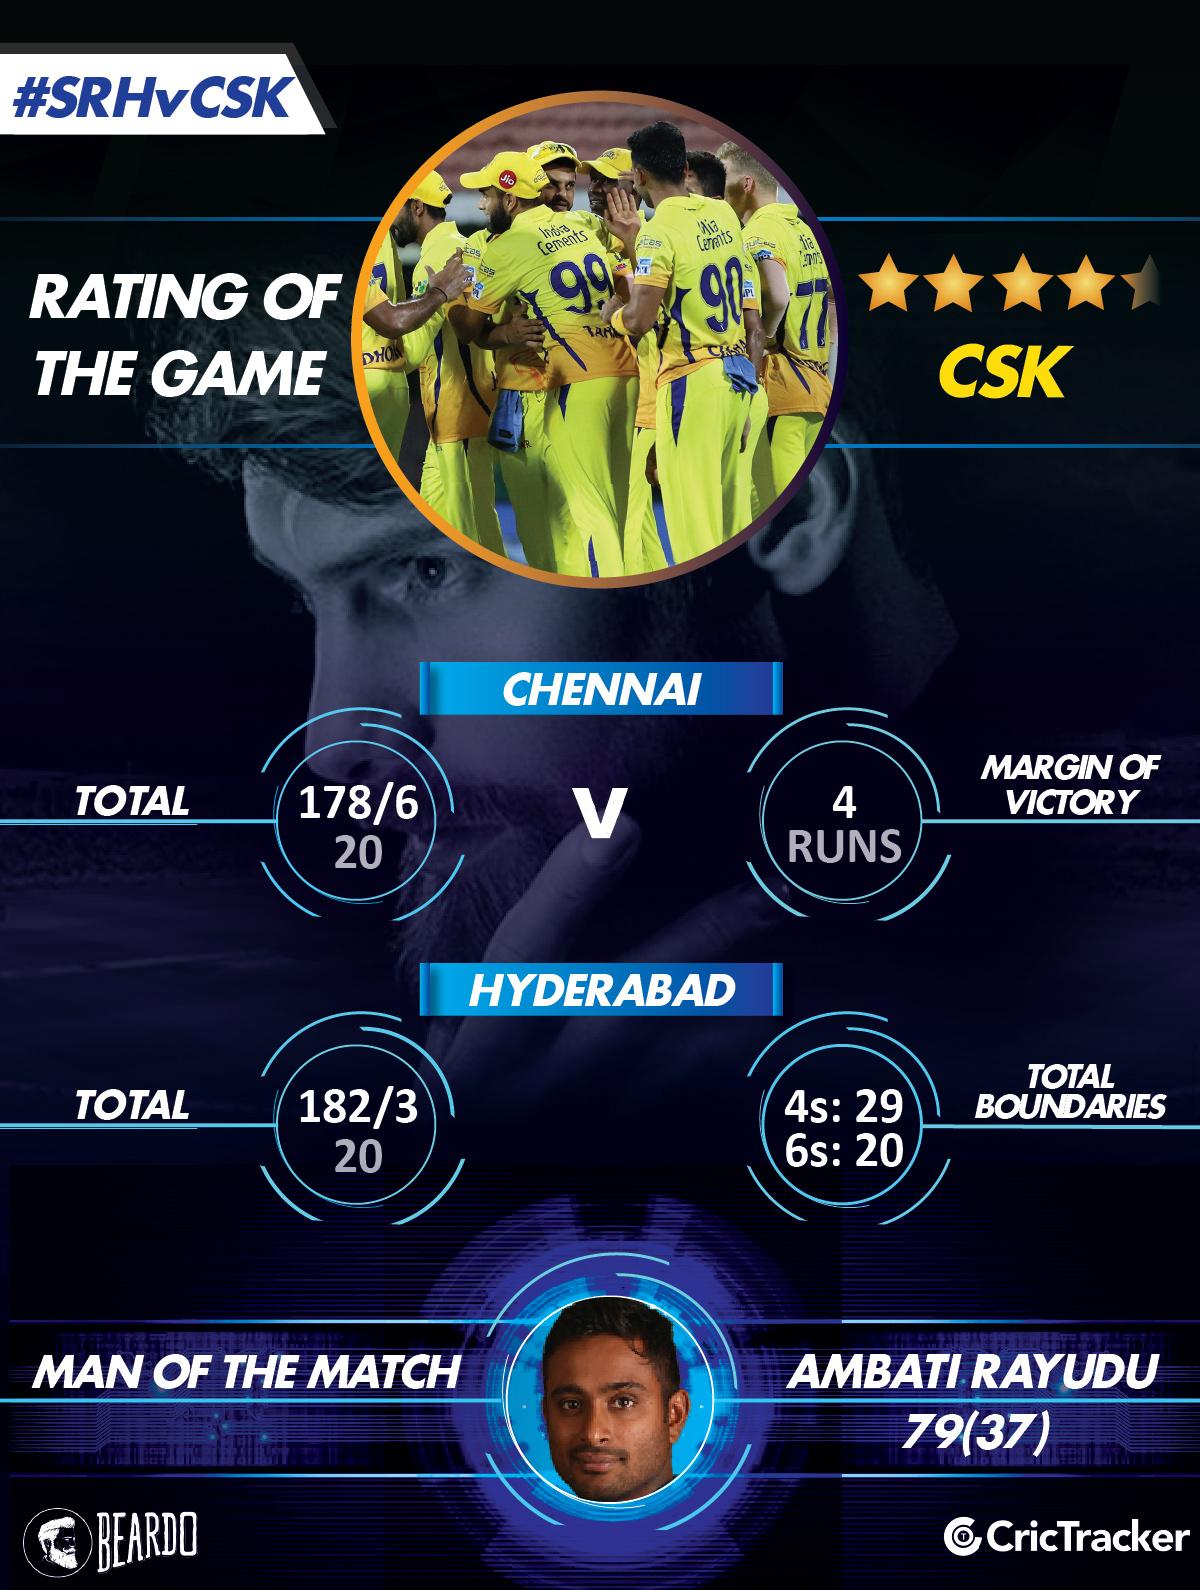 IPL2018-SRH-vs-CSK--RatinG-of-the-match-1